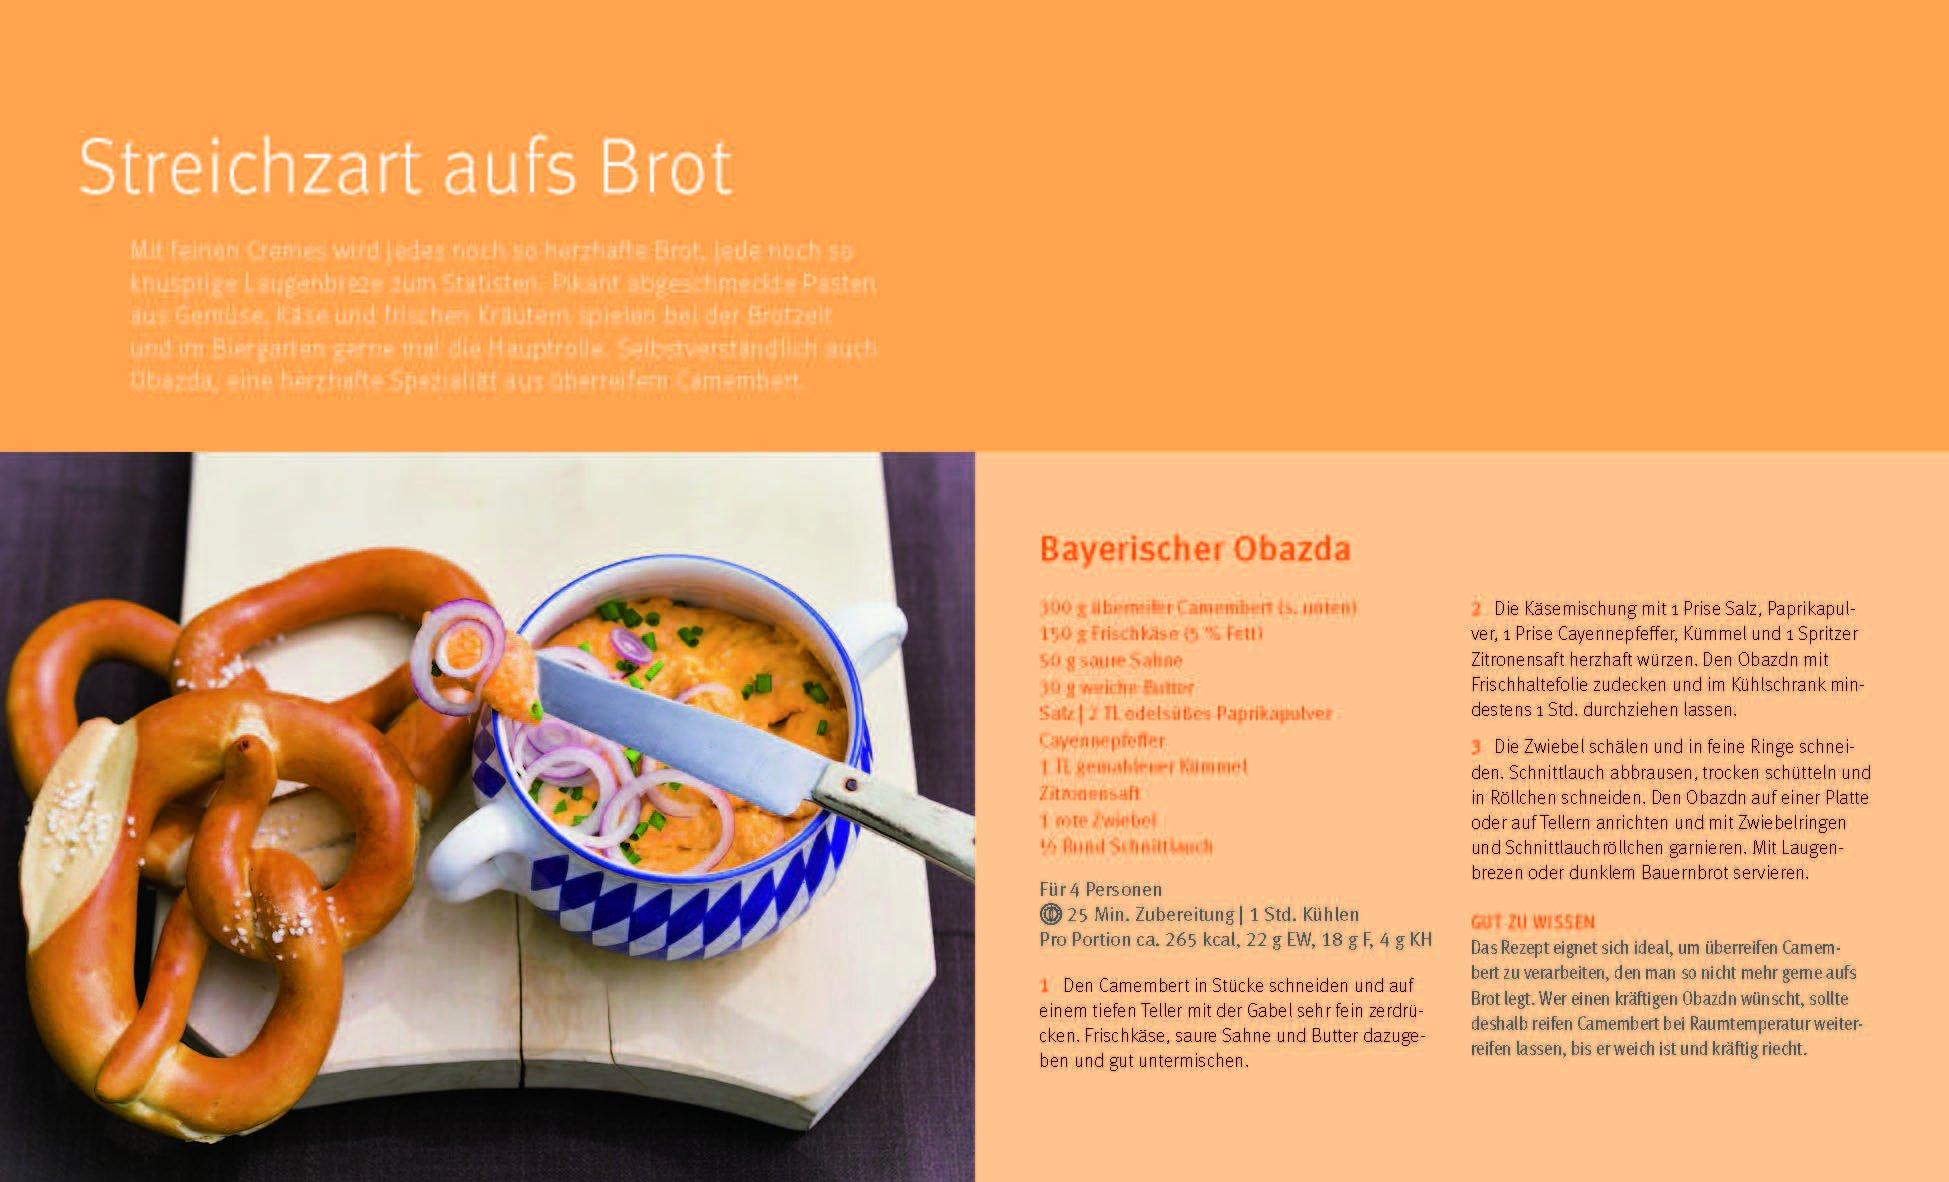 Biergartenkochbuch Bayerische Sommerküche : Brotzeit: amazon.de: petra casparek erika casparek türkkan: bücher